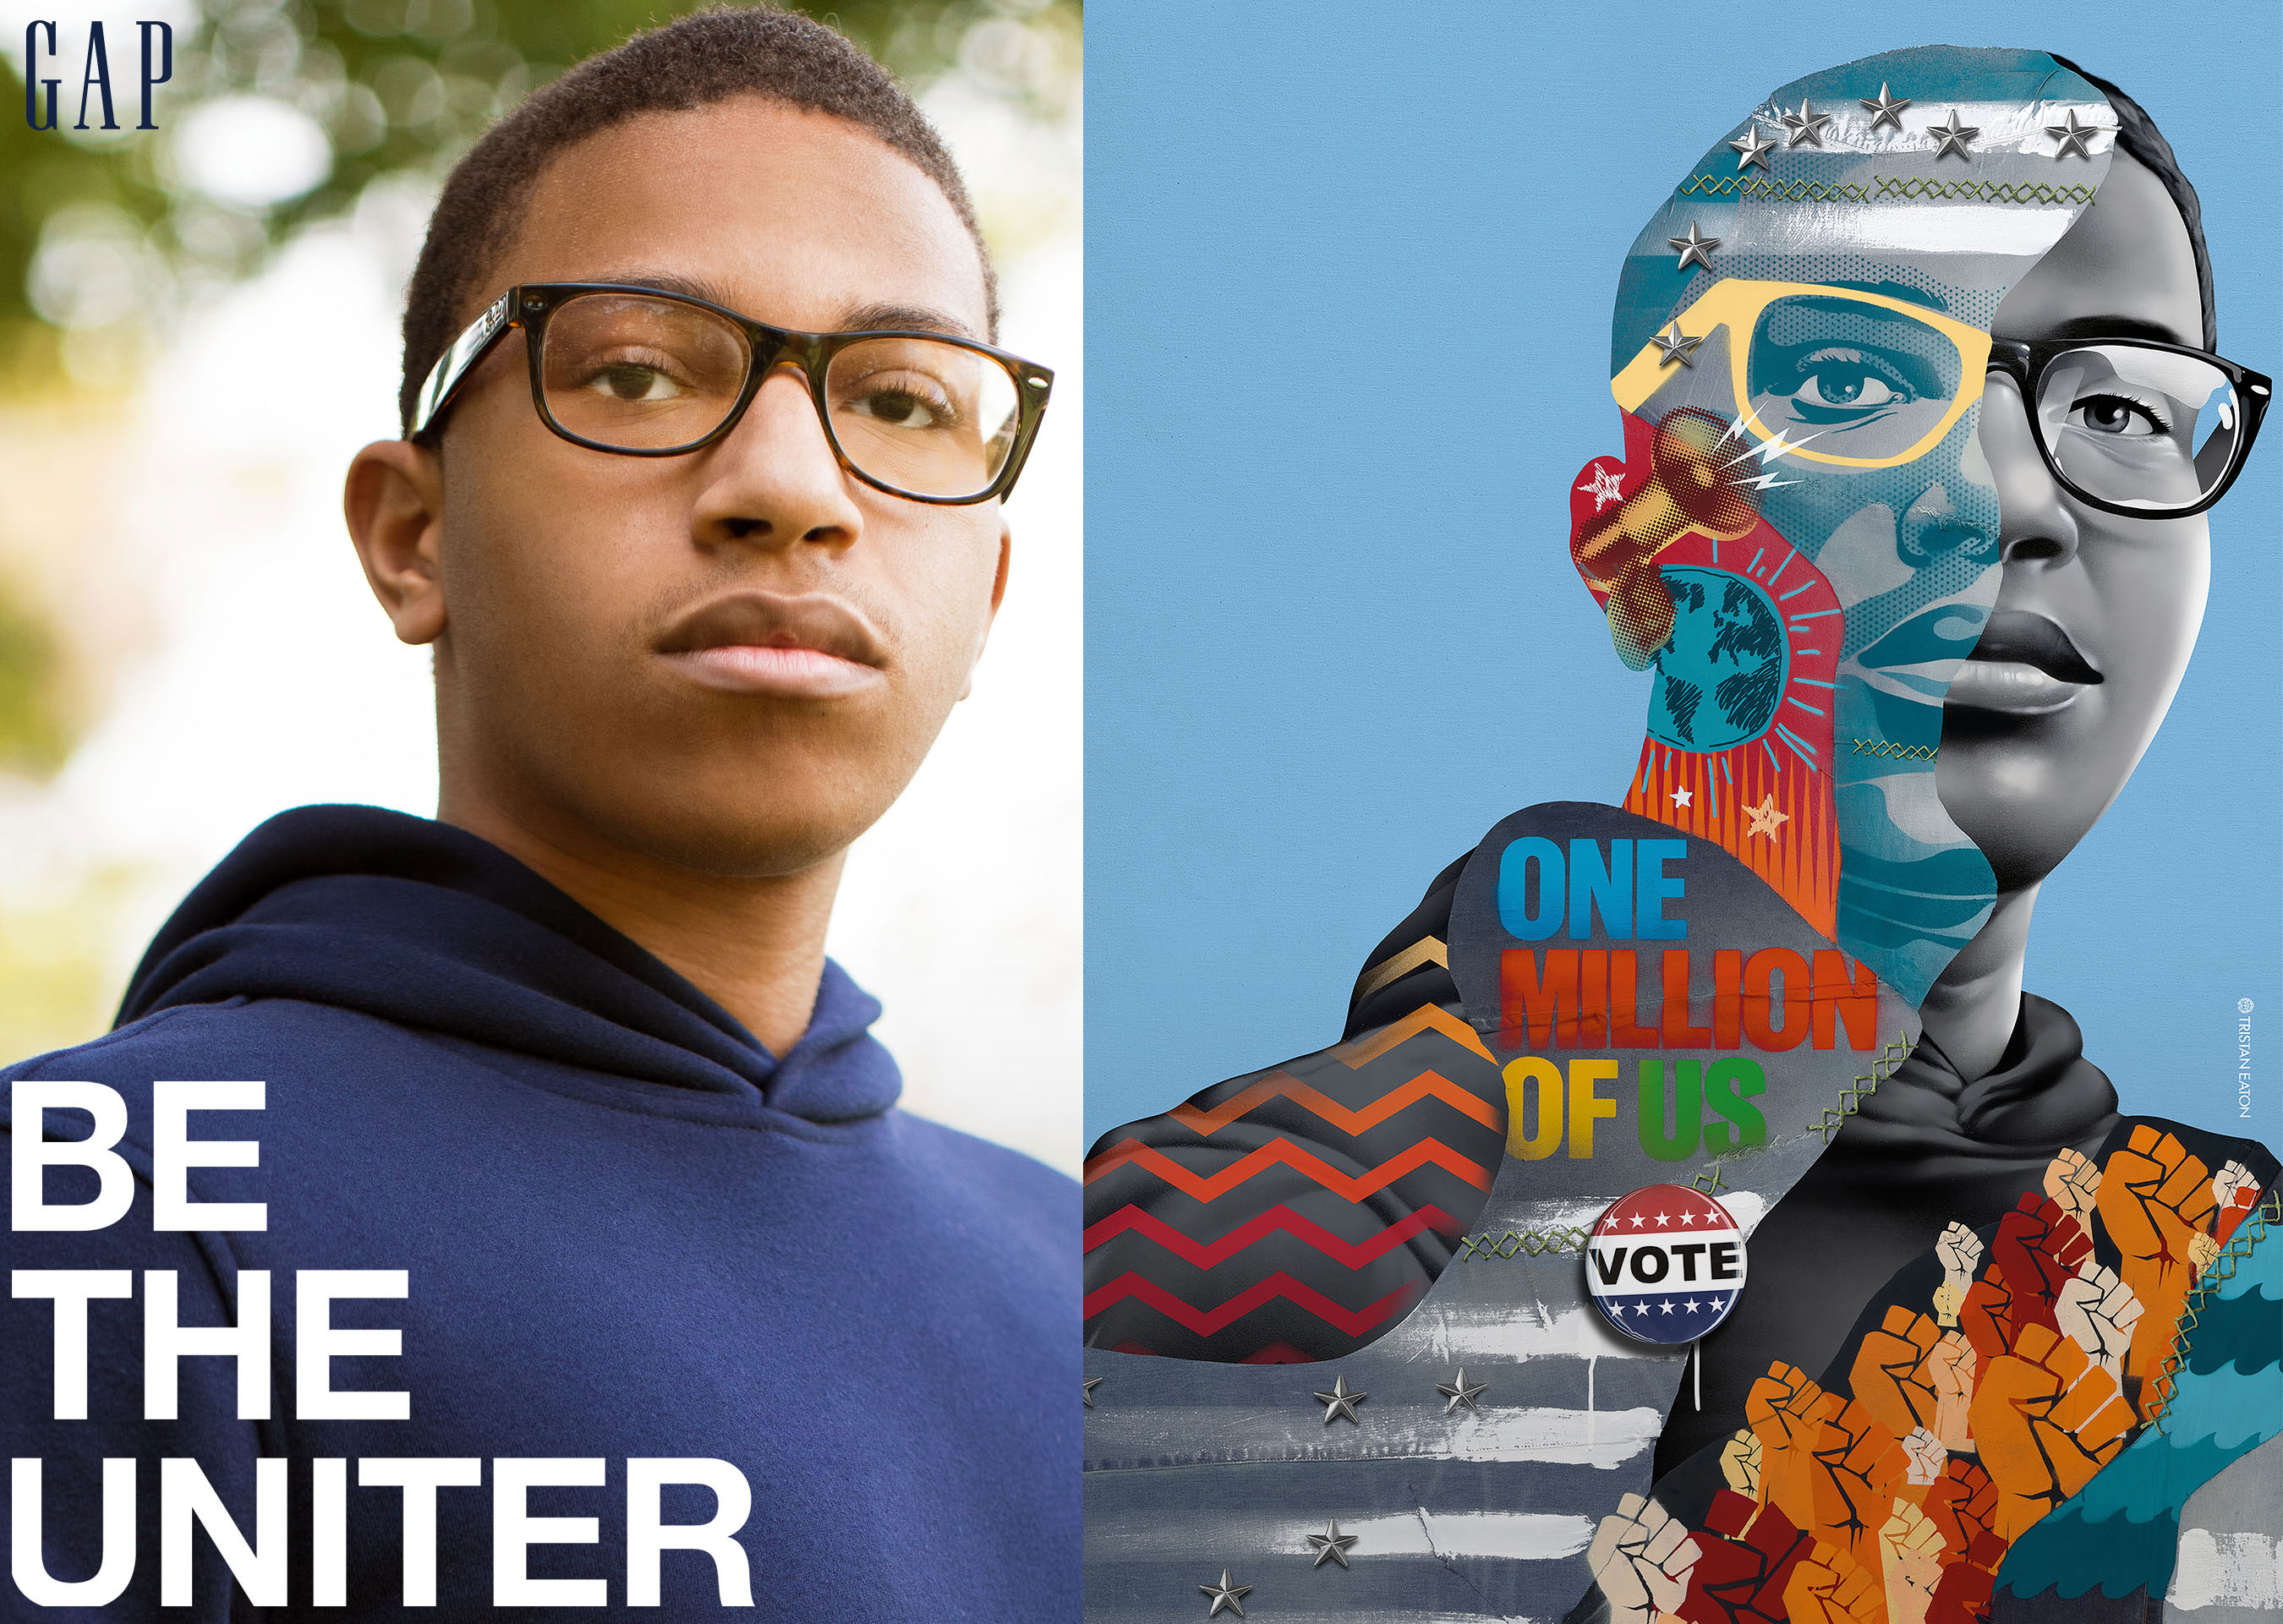 Jerome Foster II (@jeromefosterii): 18-year-old @OneMillionOfUs founder from Washington, D.C.